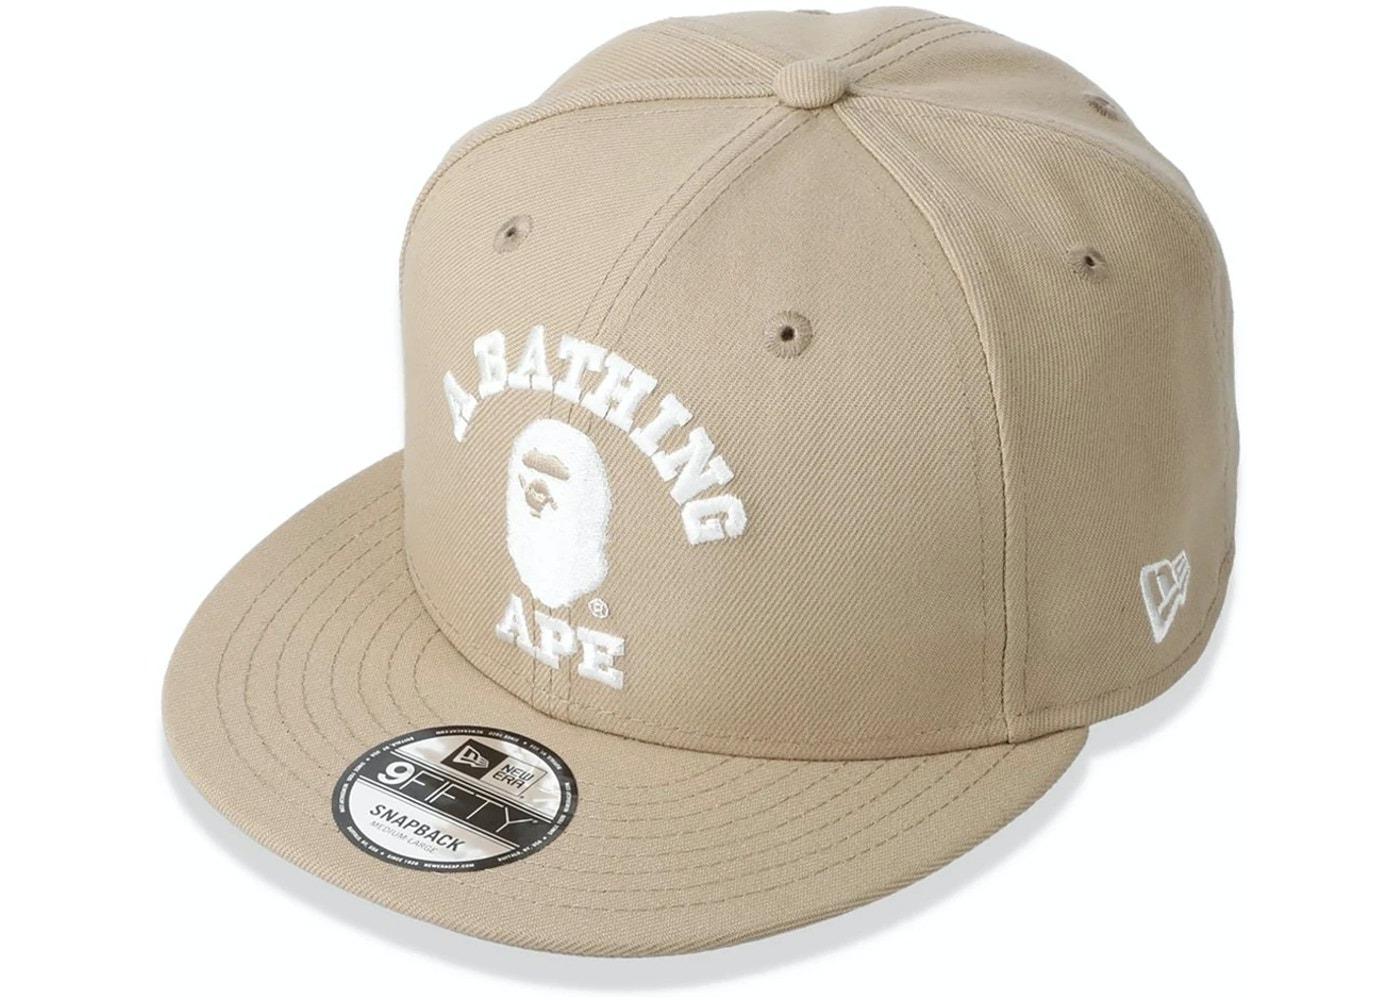 Bape College New Era Snapback Hat Beige (SS21)の写真